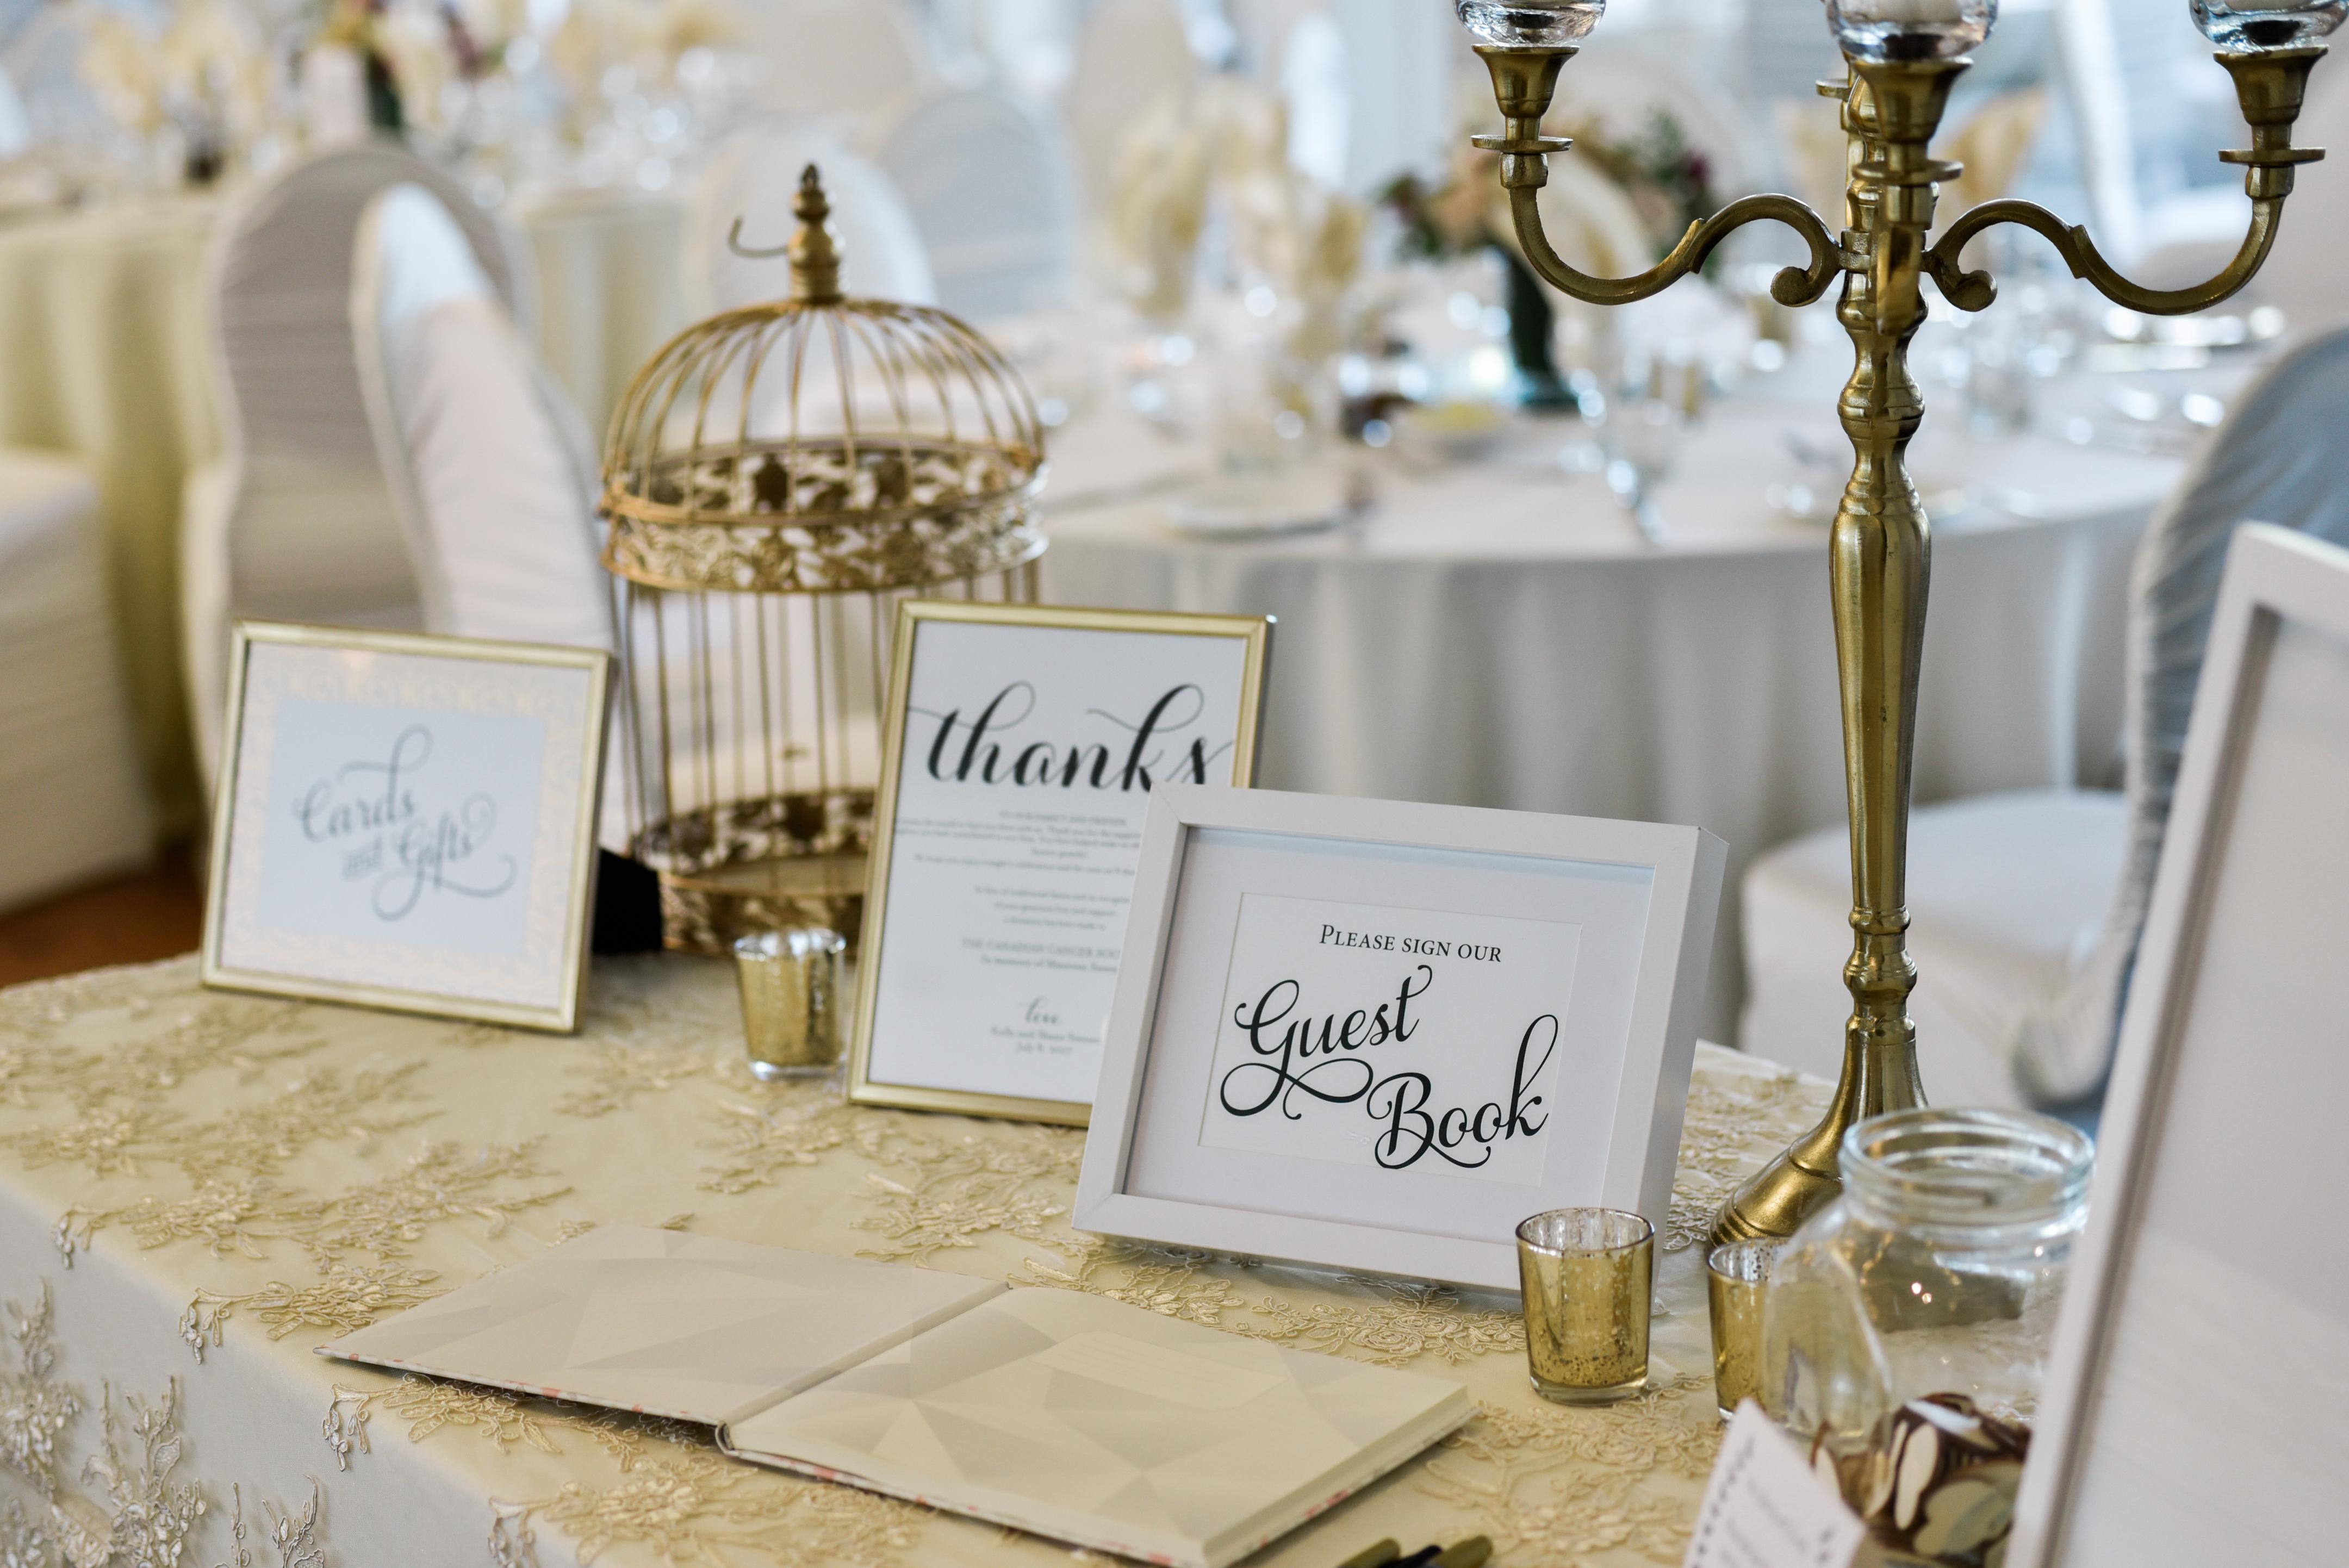 Wedding Decor - Ceremony & Reception Decor - Head Table, Backdrop at ...